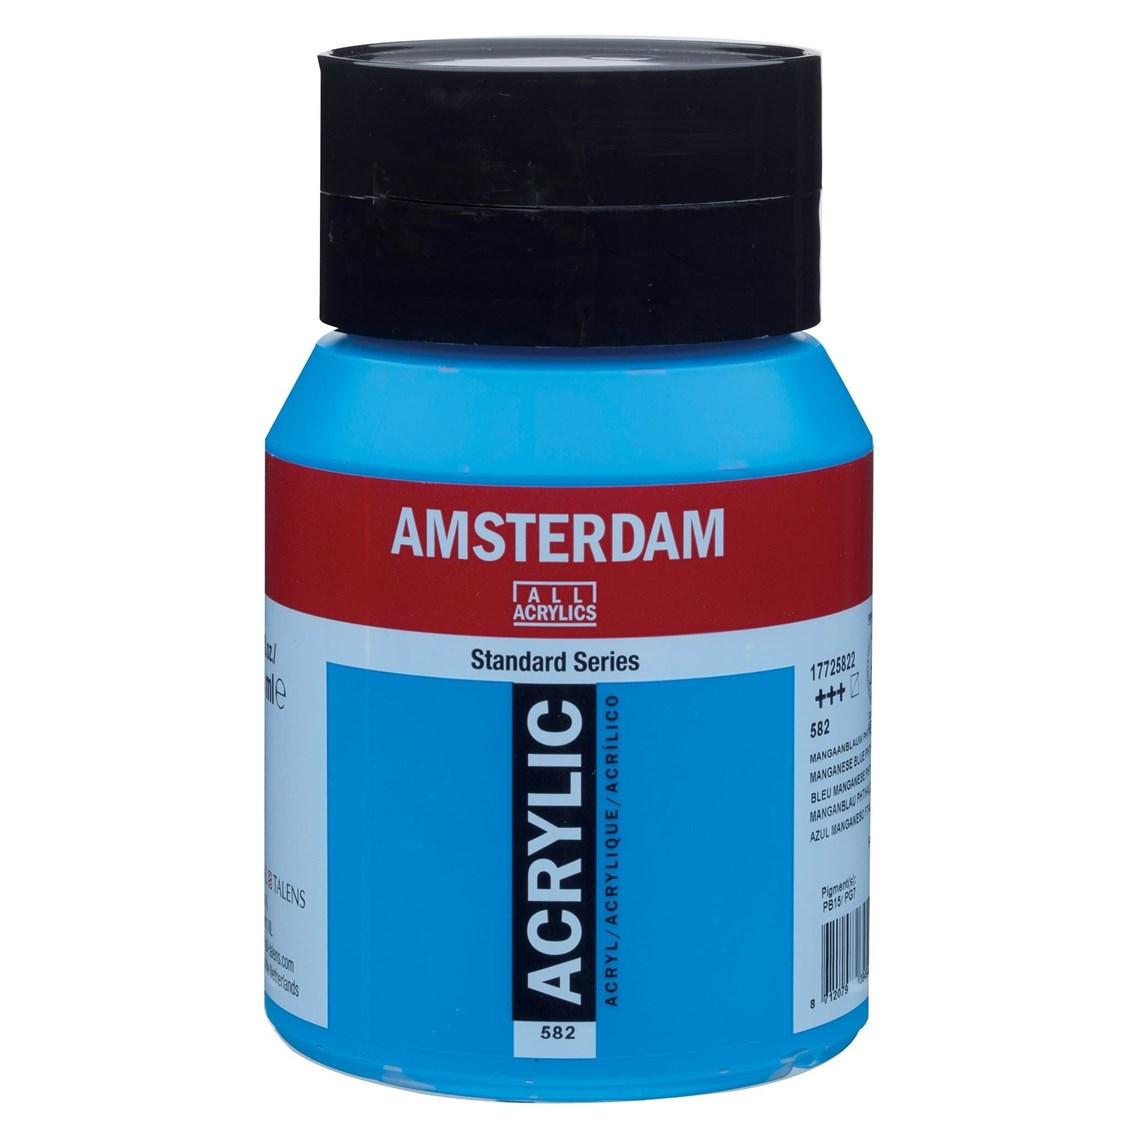 Amsterdam acrylverf Mangaanblauw phtalo 582 Angelart Kunst en zo